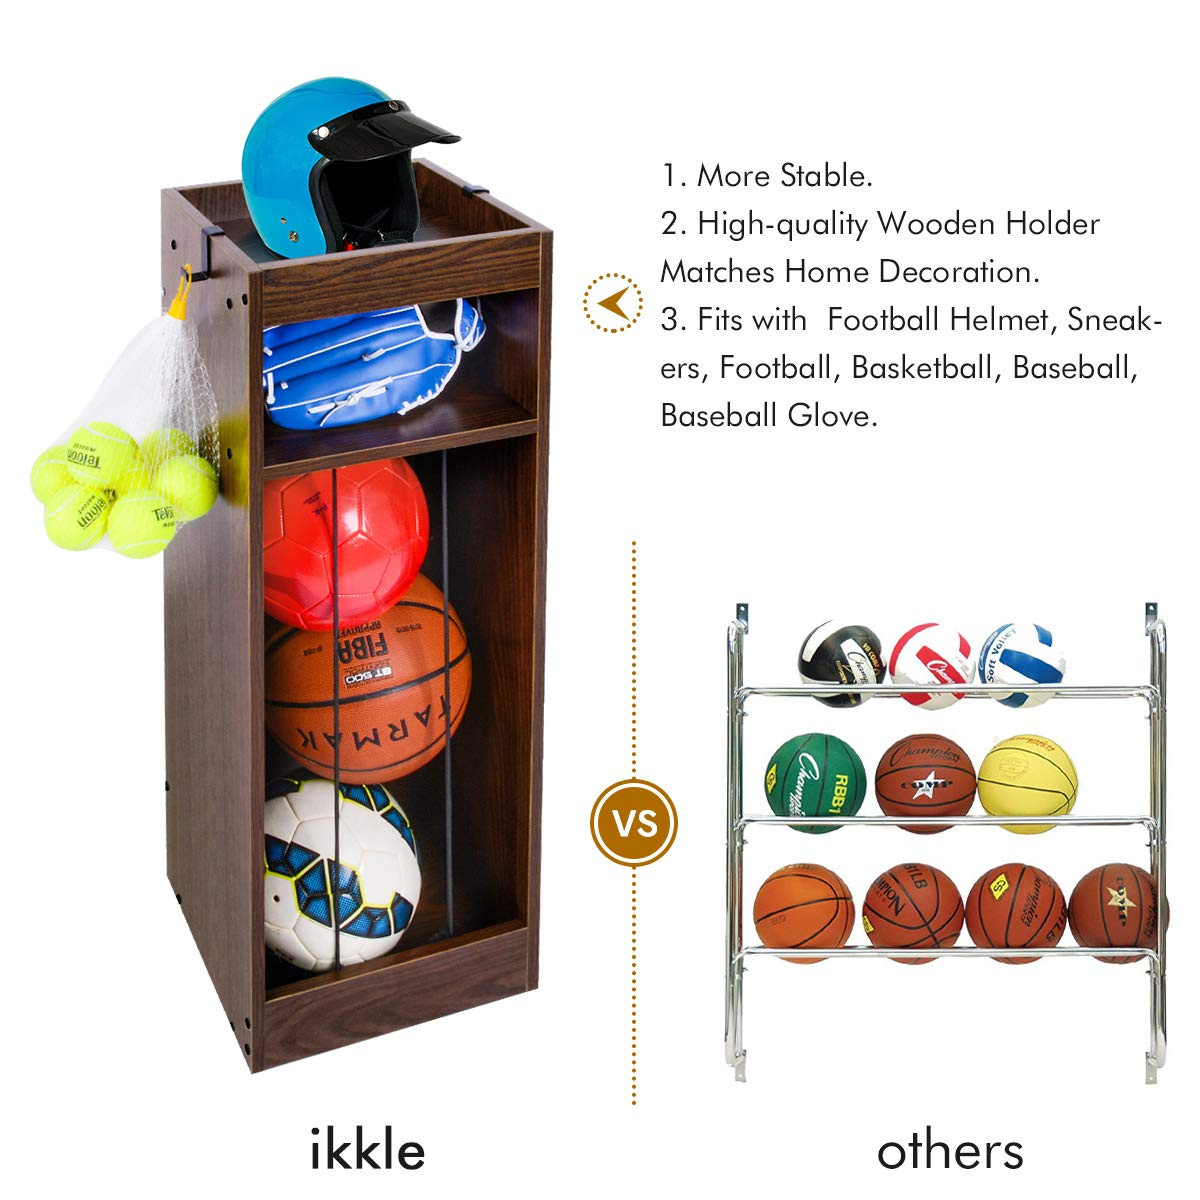 Sport Storage Organizer 3 Tiers for Football Helmet Vintage Wooden Cabinet with 2 Metal Hooks Baseball for Baseball/Glove Sneakers Black Football Basketball